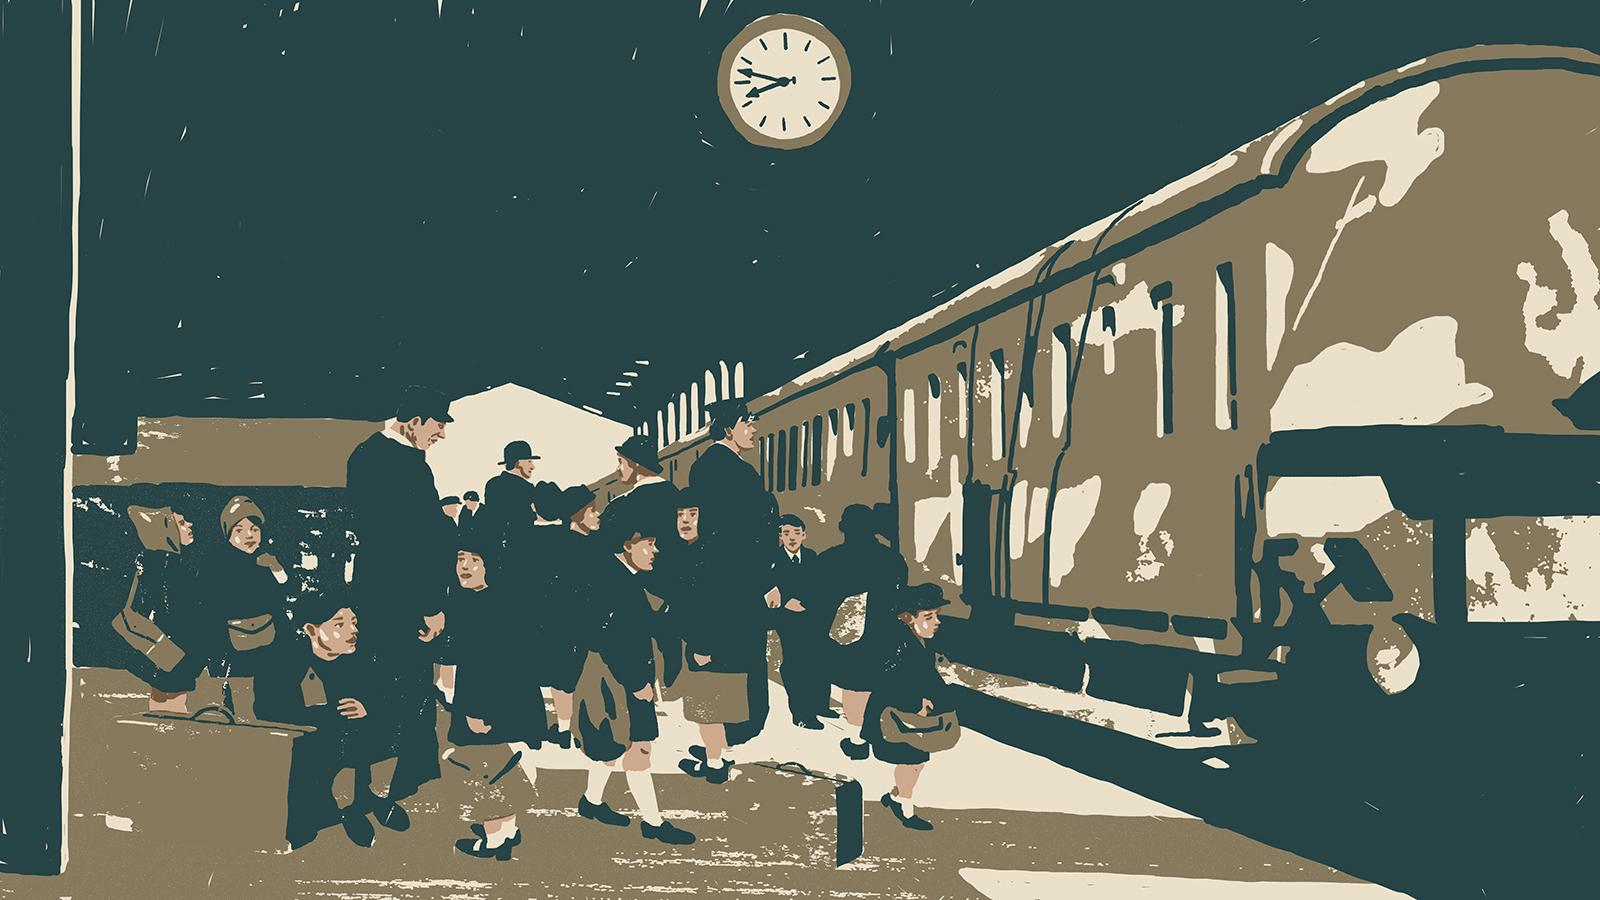 Kindertransport: As WWII loomed, Britain saved 10,000 child refugees